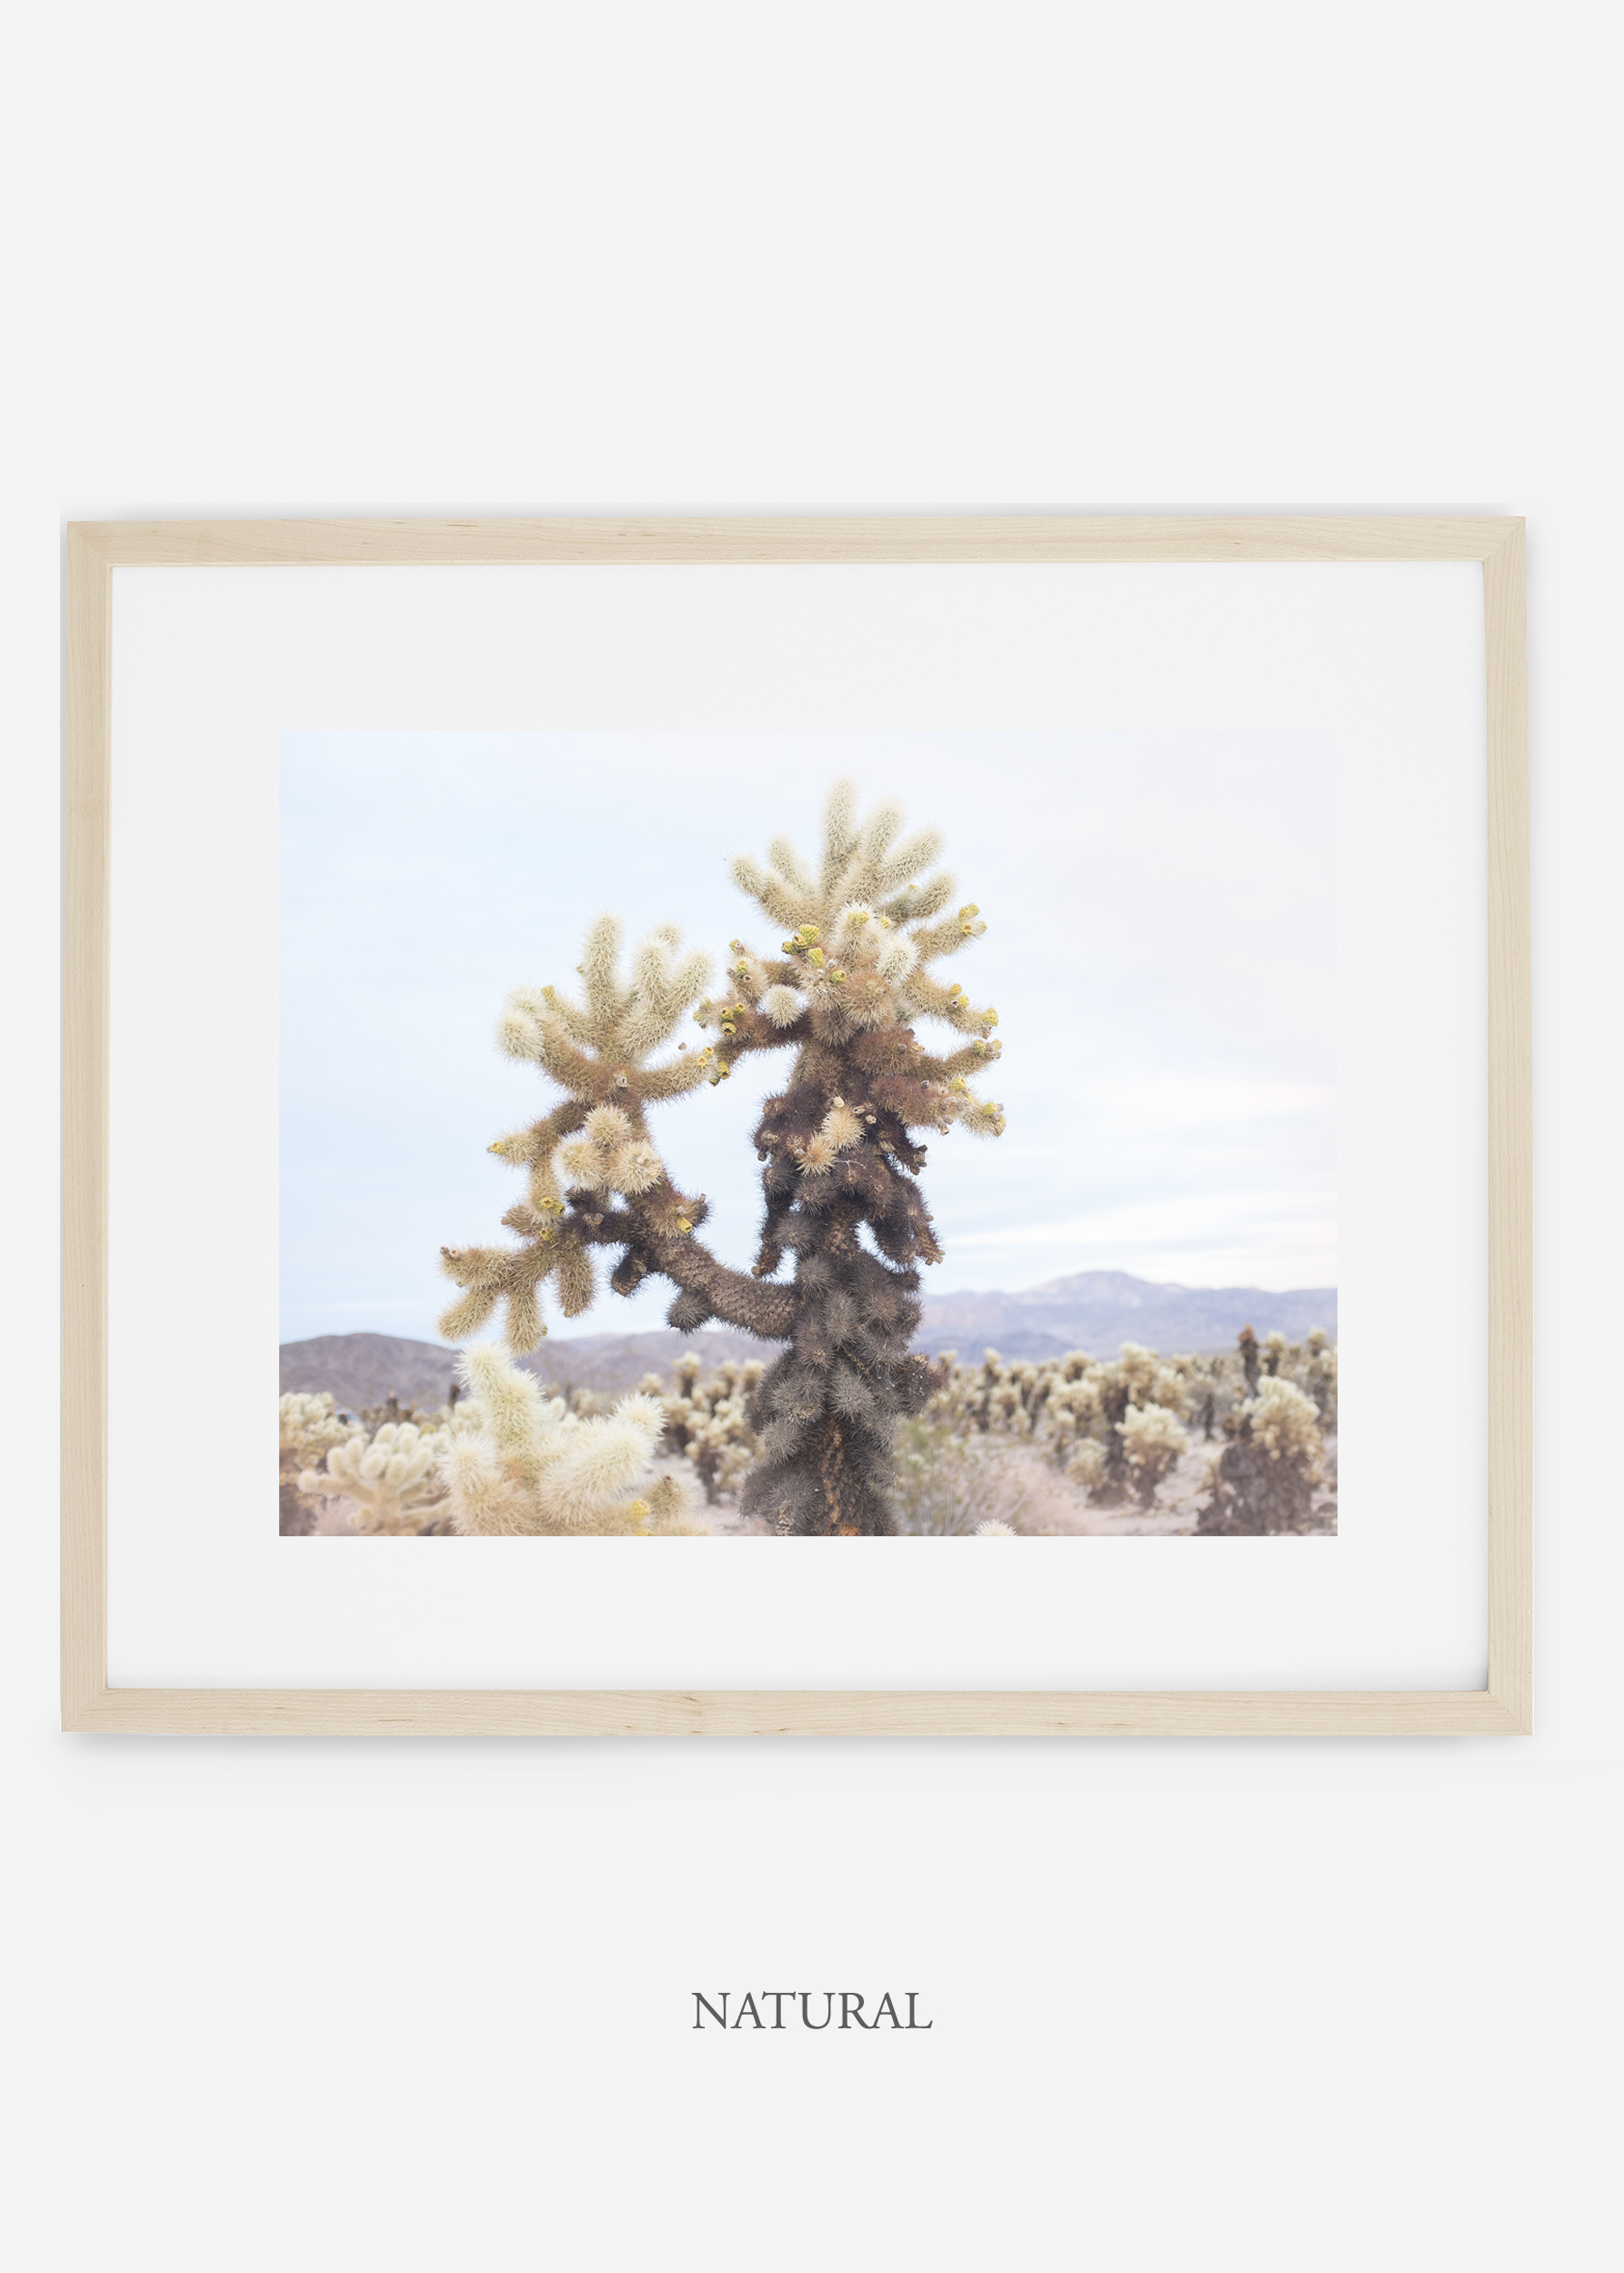 JoshuaTree_naturalframe__No.10_interiordesign_cactusprint_art.jpg